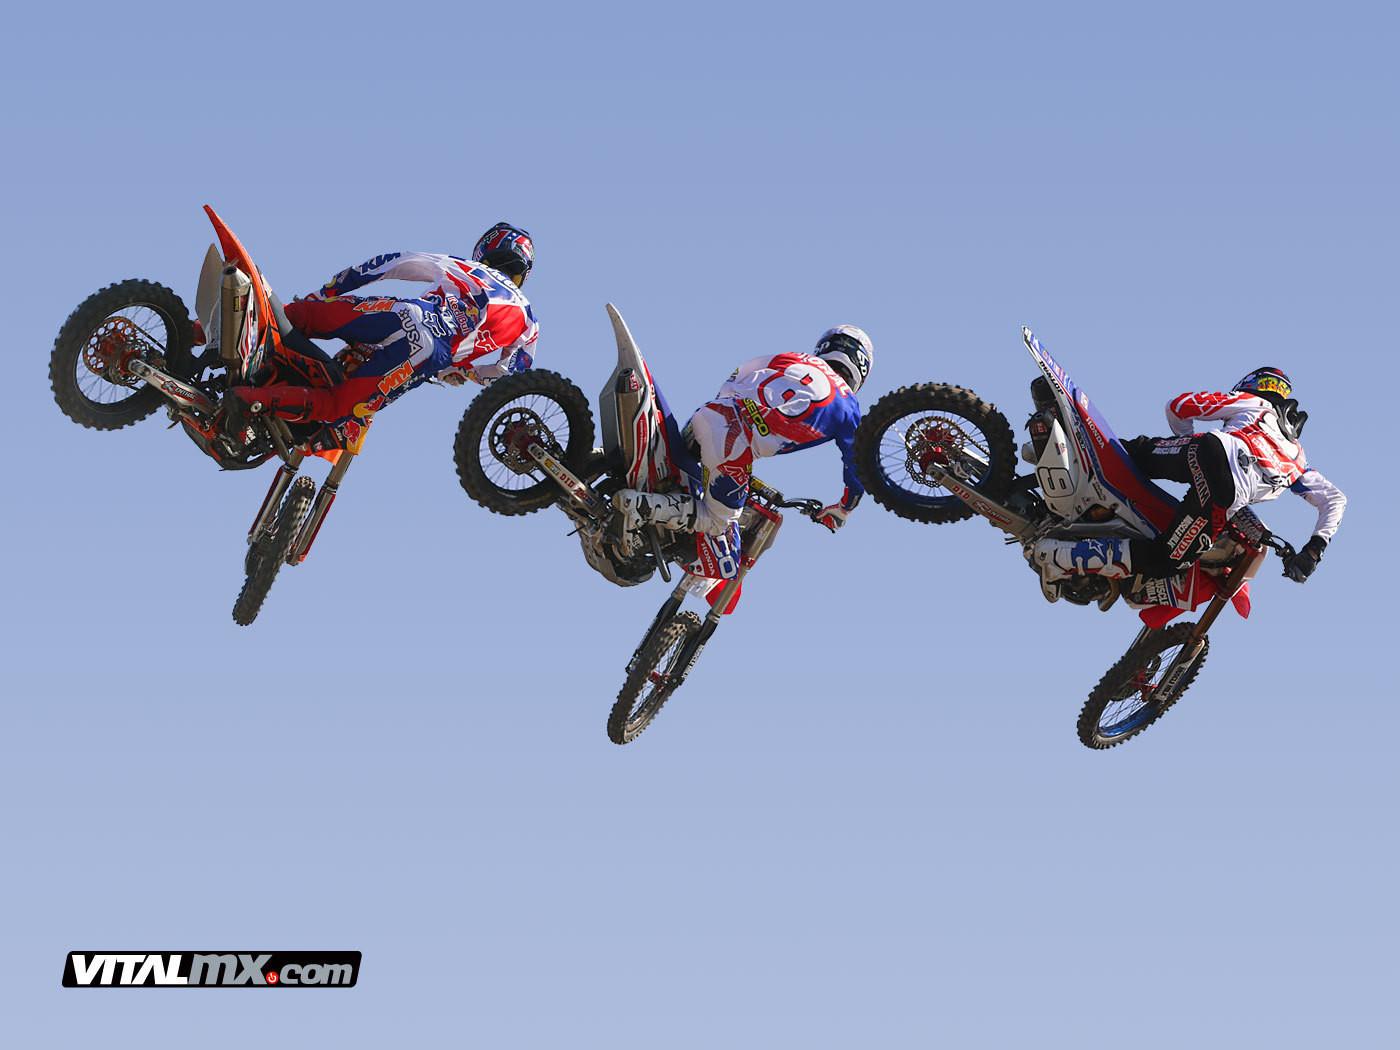 Team USA 2013: Ryan Dungey, Eli Tomac, and Justin Barcia - Team USA 2013 - Motocross Pictures - Vital MX